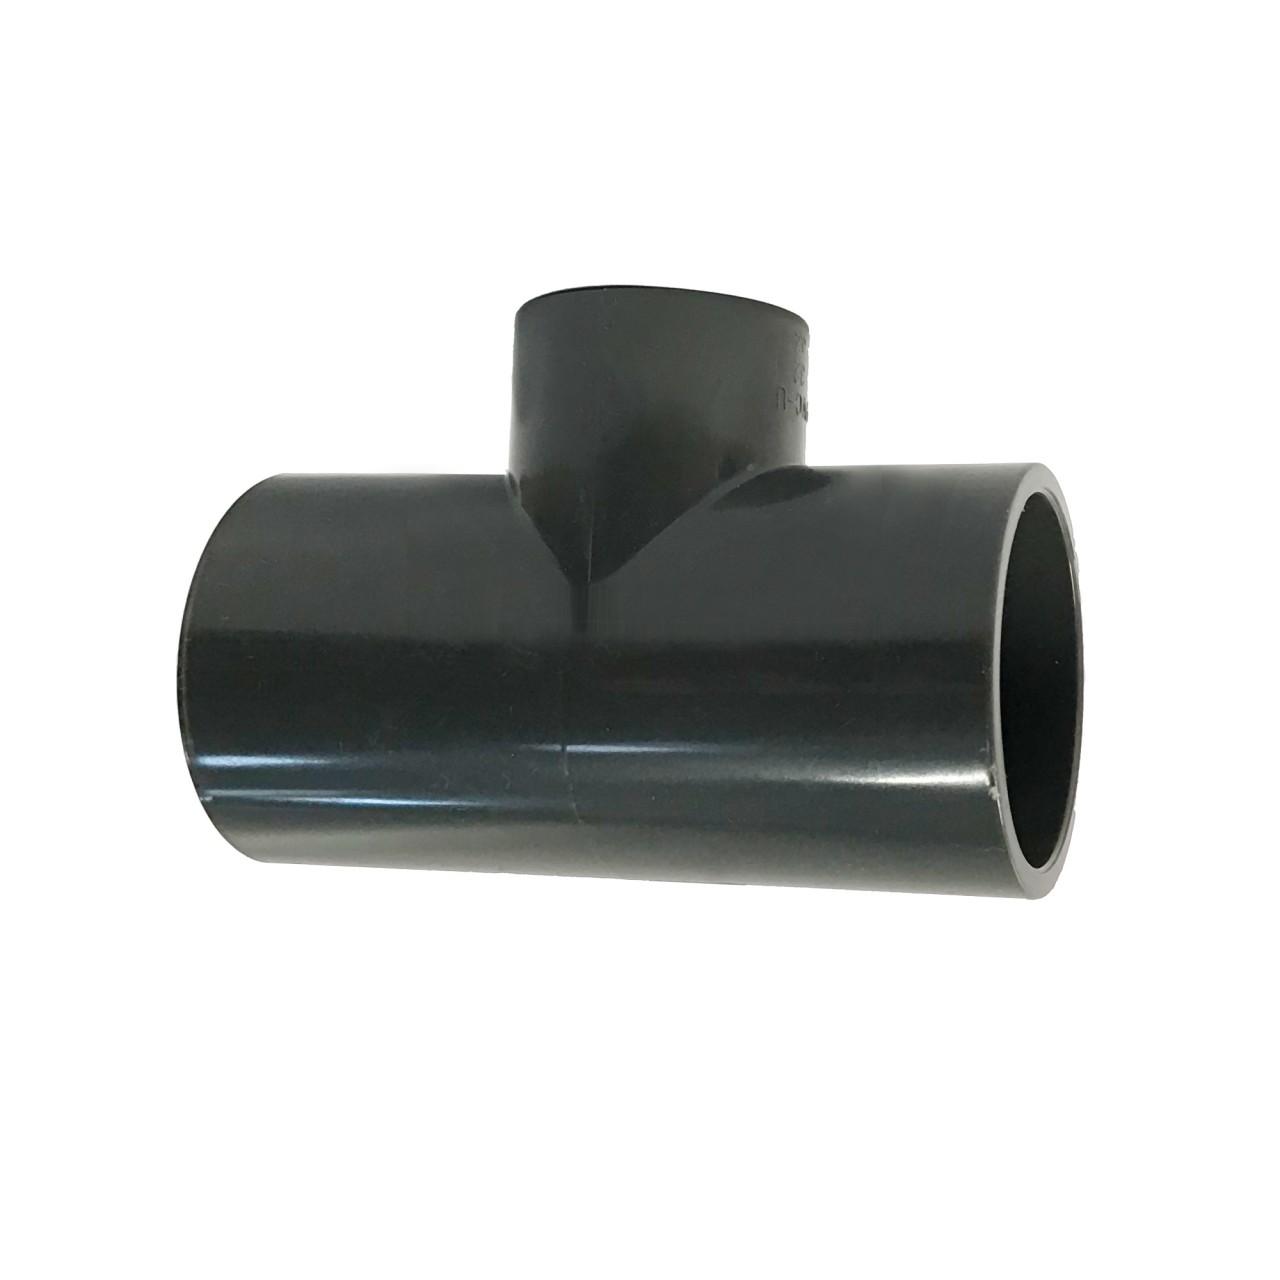 PVC-U T-Stück reduziert dreifach Klebemuffe 50 x 32 mm